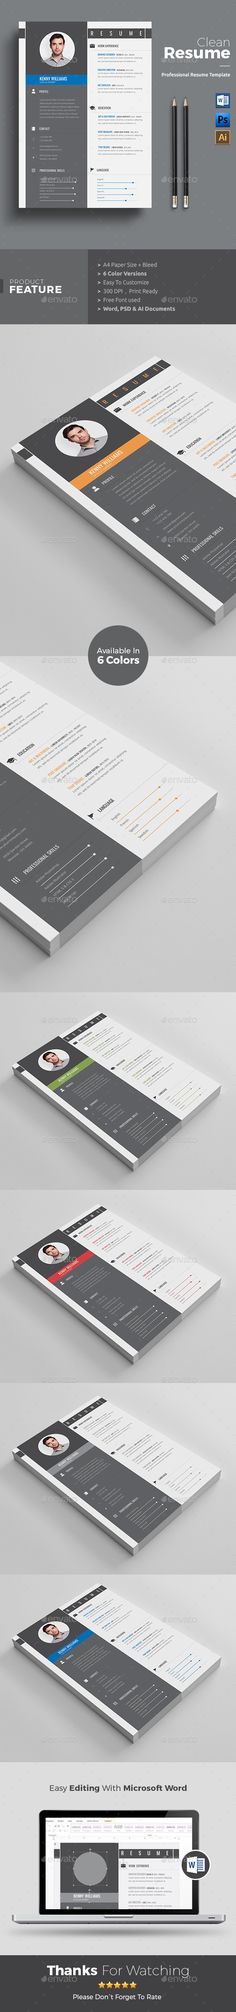 Resume / CV Template #design Download: http://graphicriver.net/item/resume-cv-/13599178?ref=ksioks